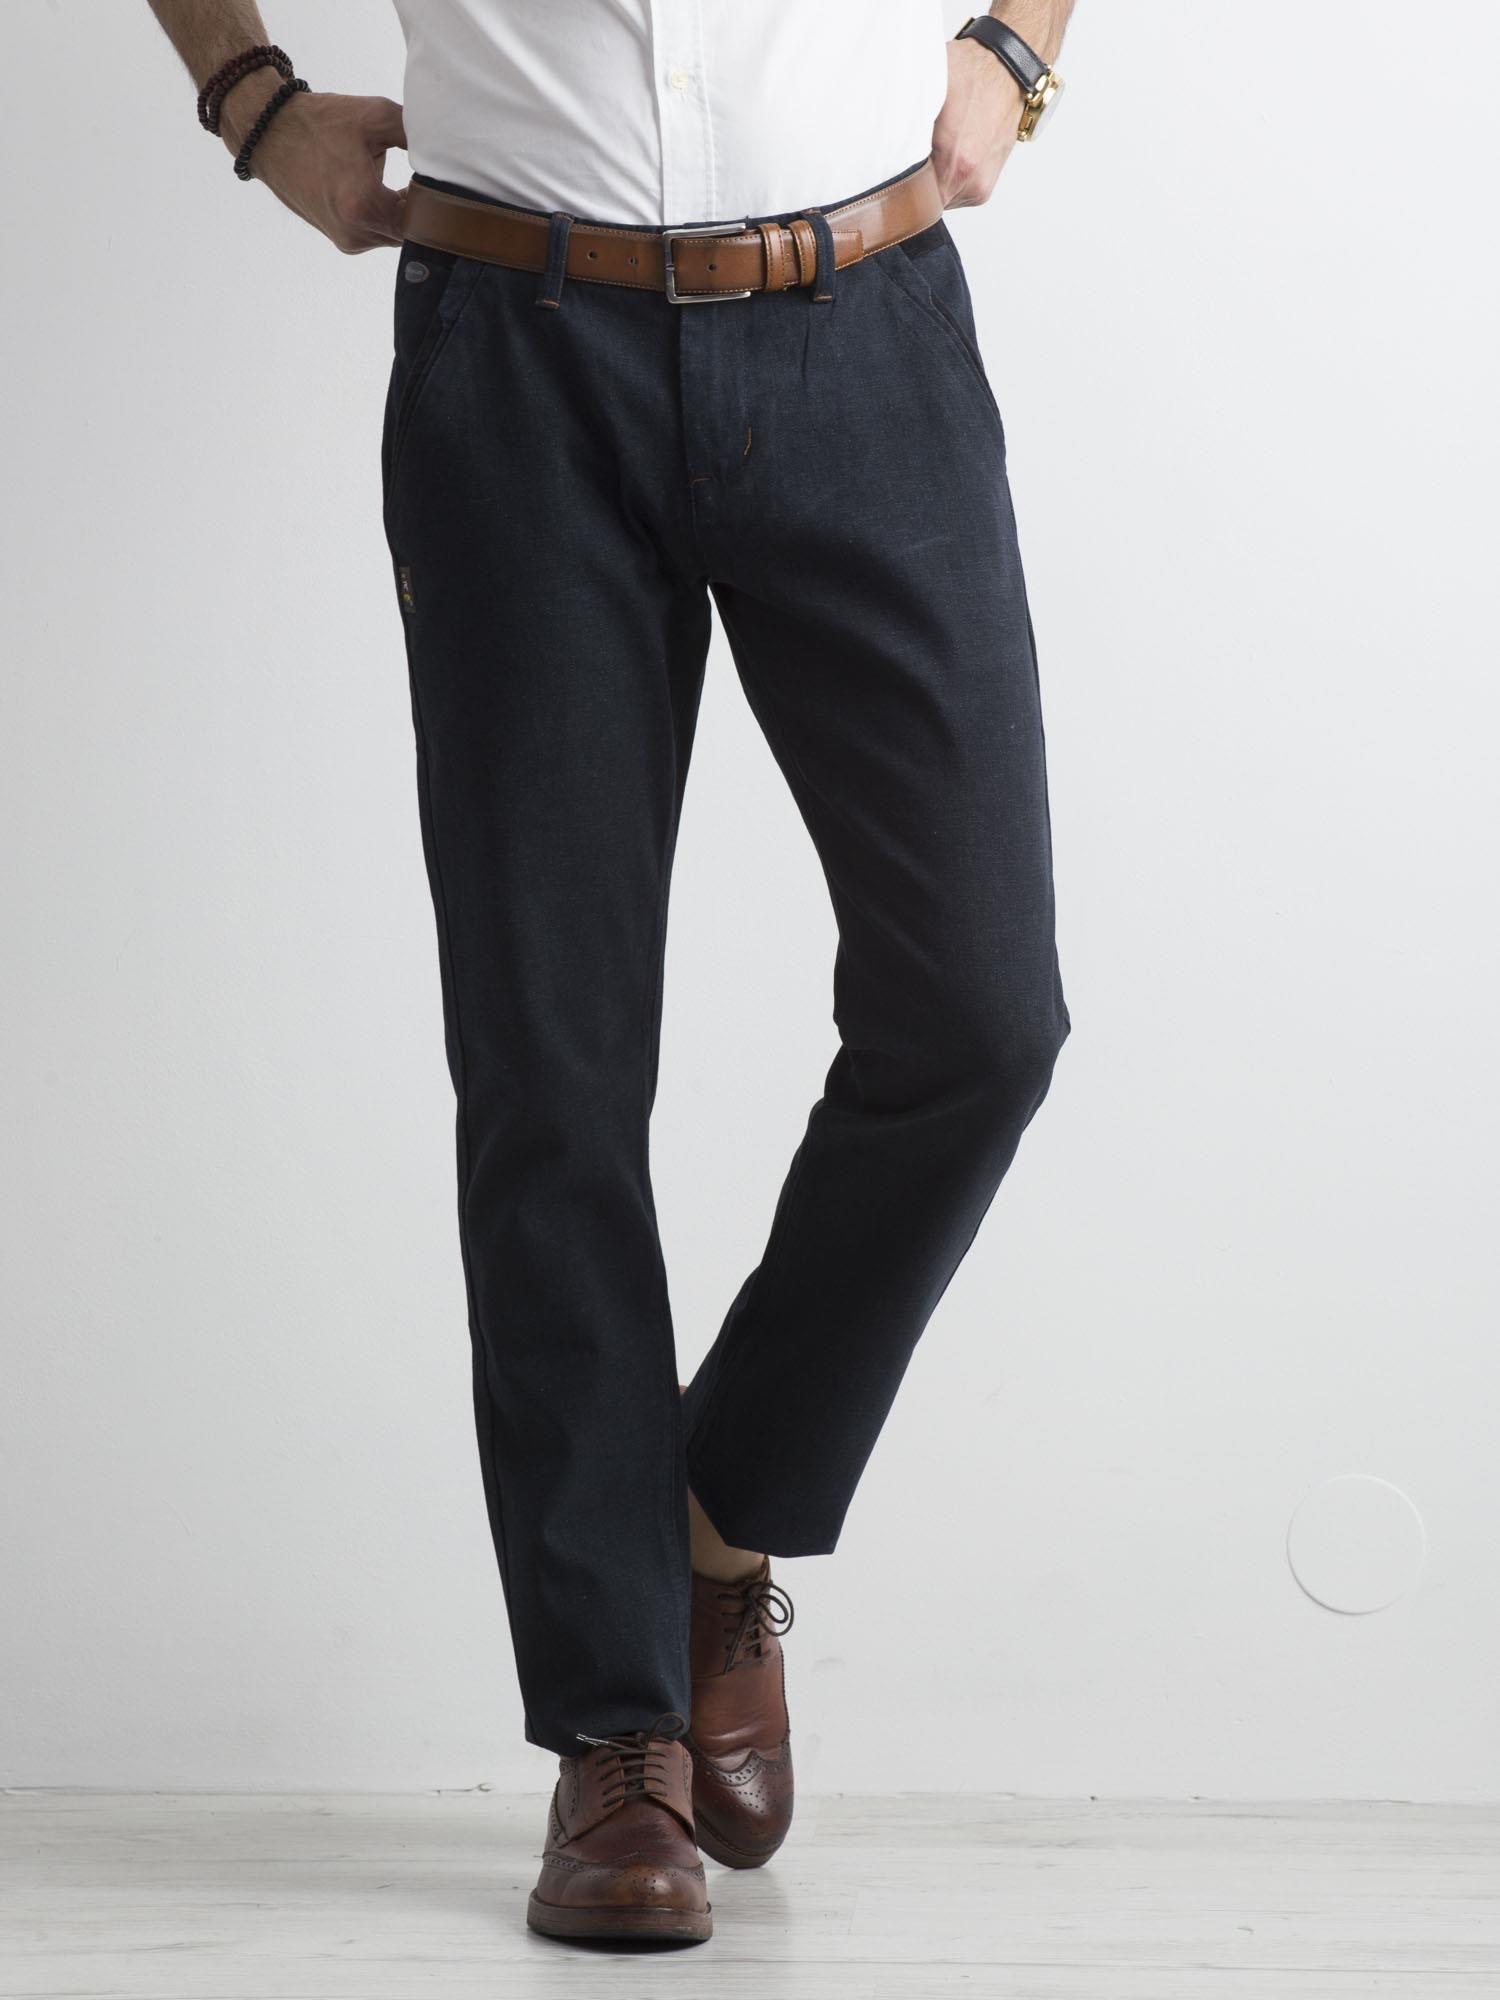 7e0084da Granatowe męskie spodnie chinosy